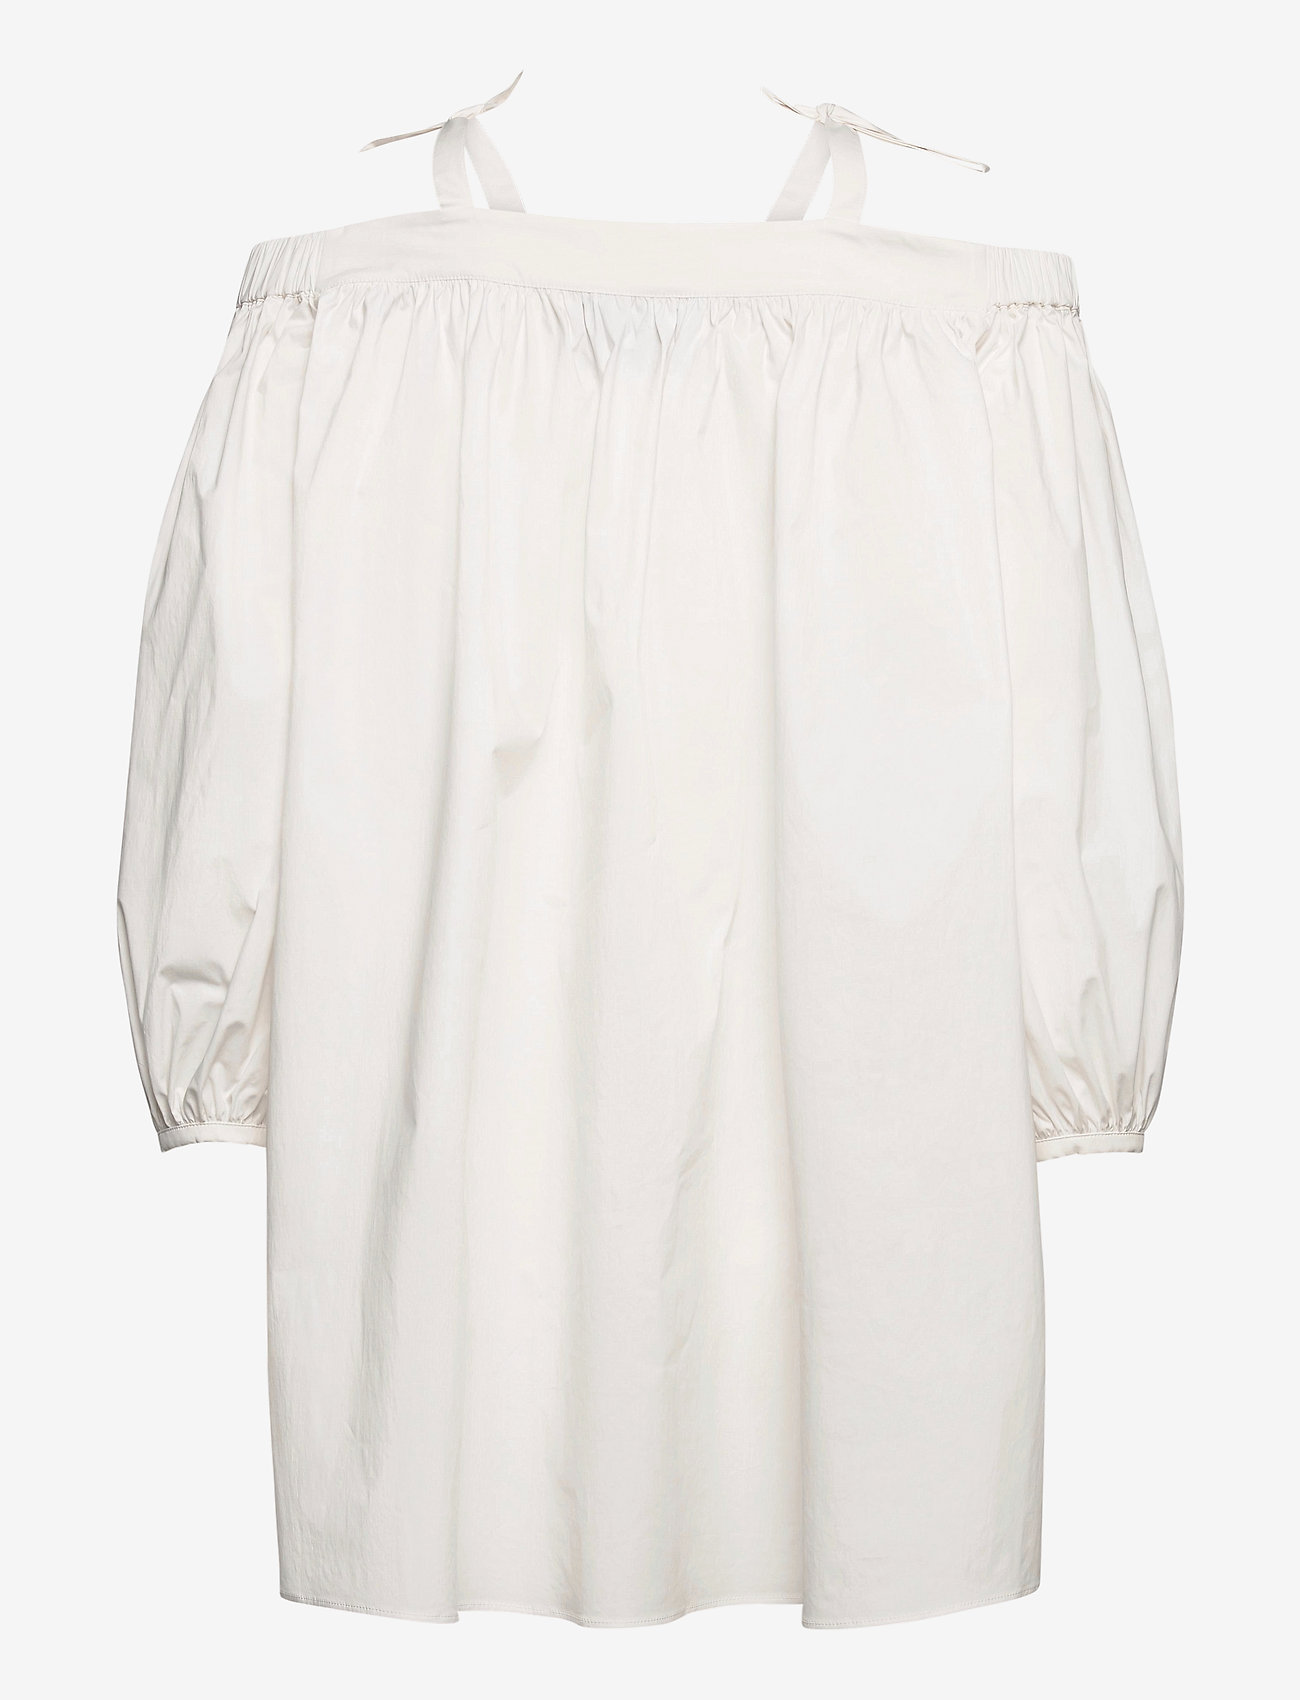 Boutique Moschino - Boutique Moschino DRESS - sommerkjoler - white - 1